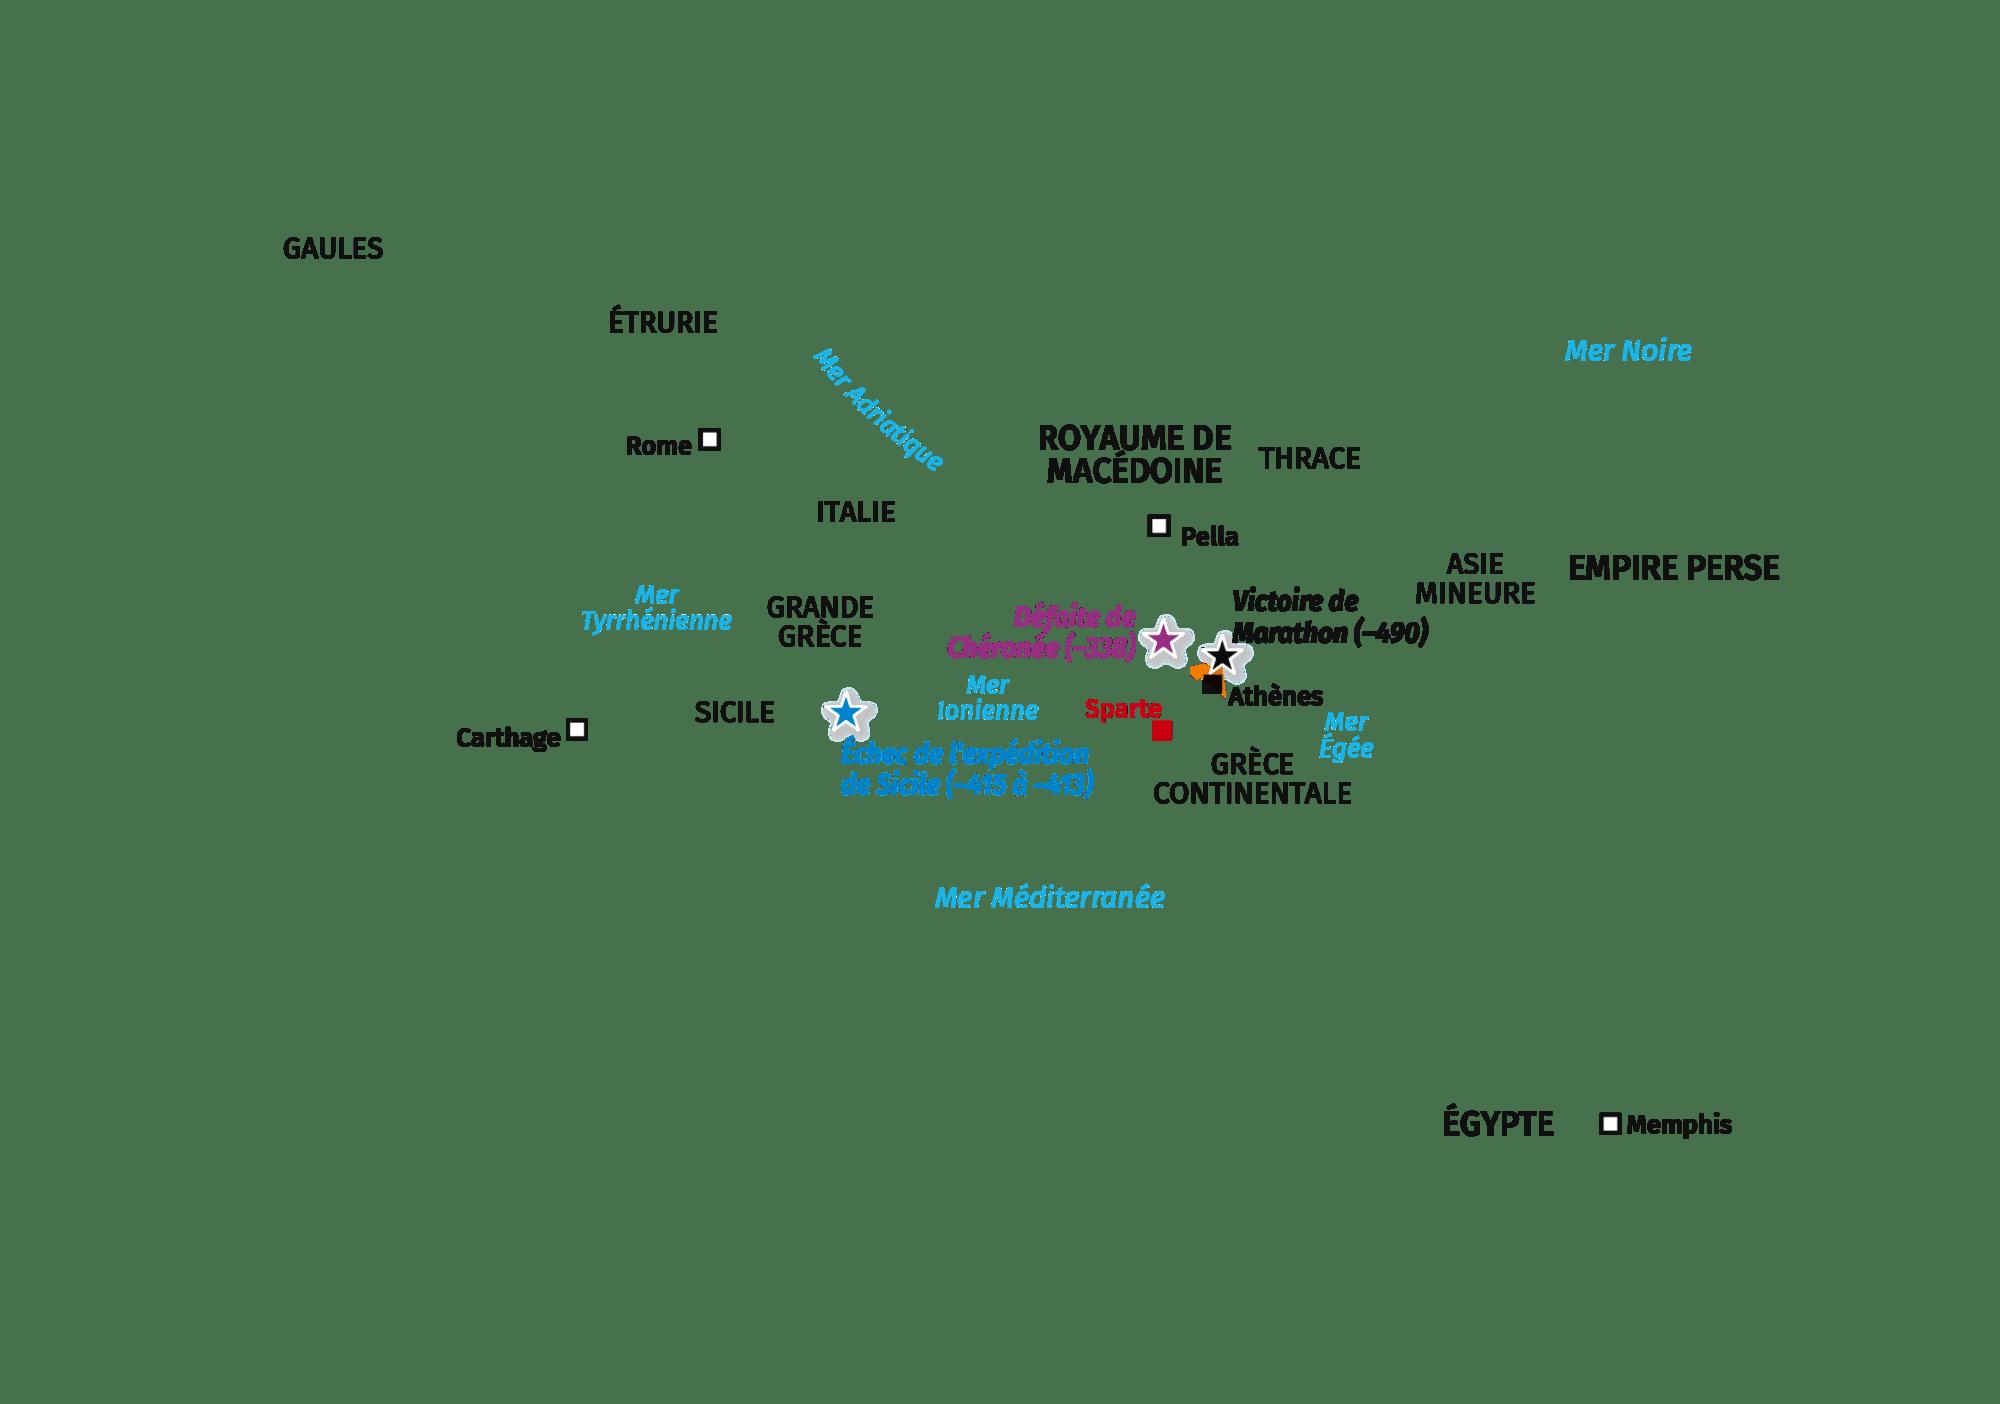 II. Un monde grec dominé par Athènes